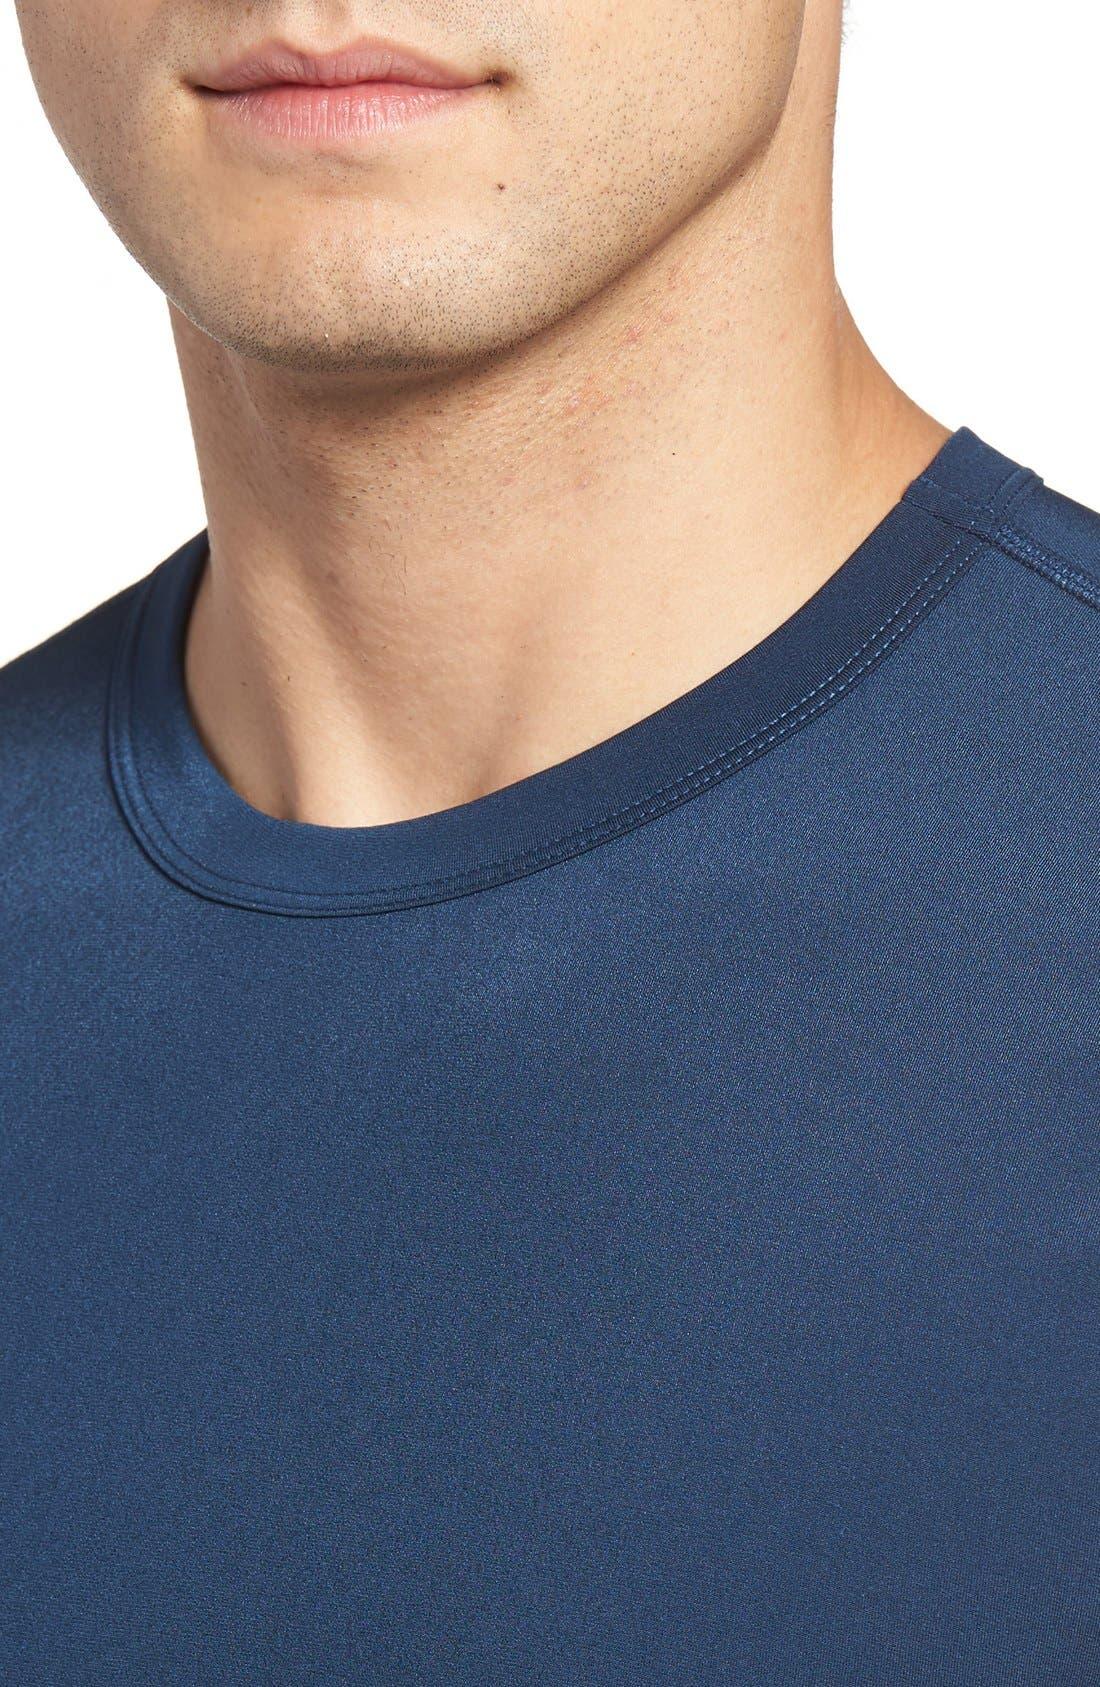 Long Sleeve Stretch Rashguard,                             Alternate thumbnail 8, color,                             DEEP BLUE